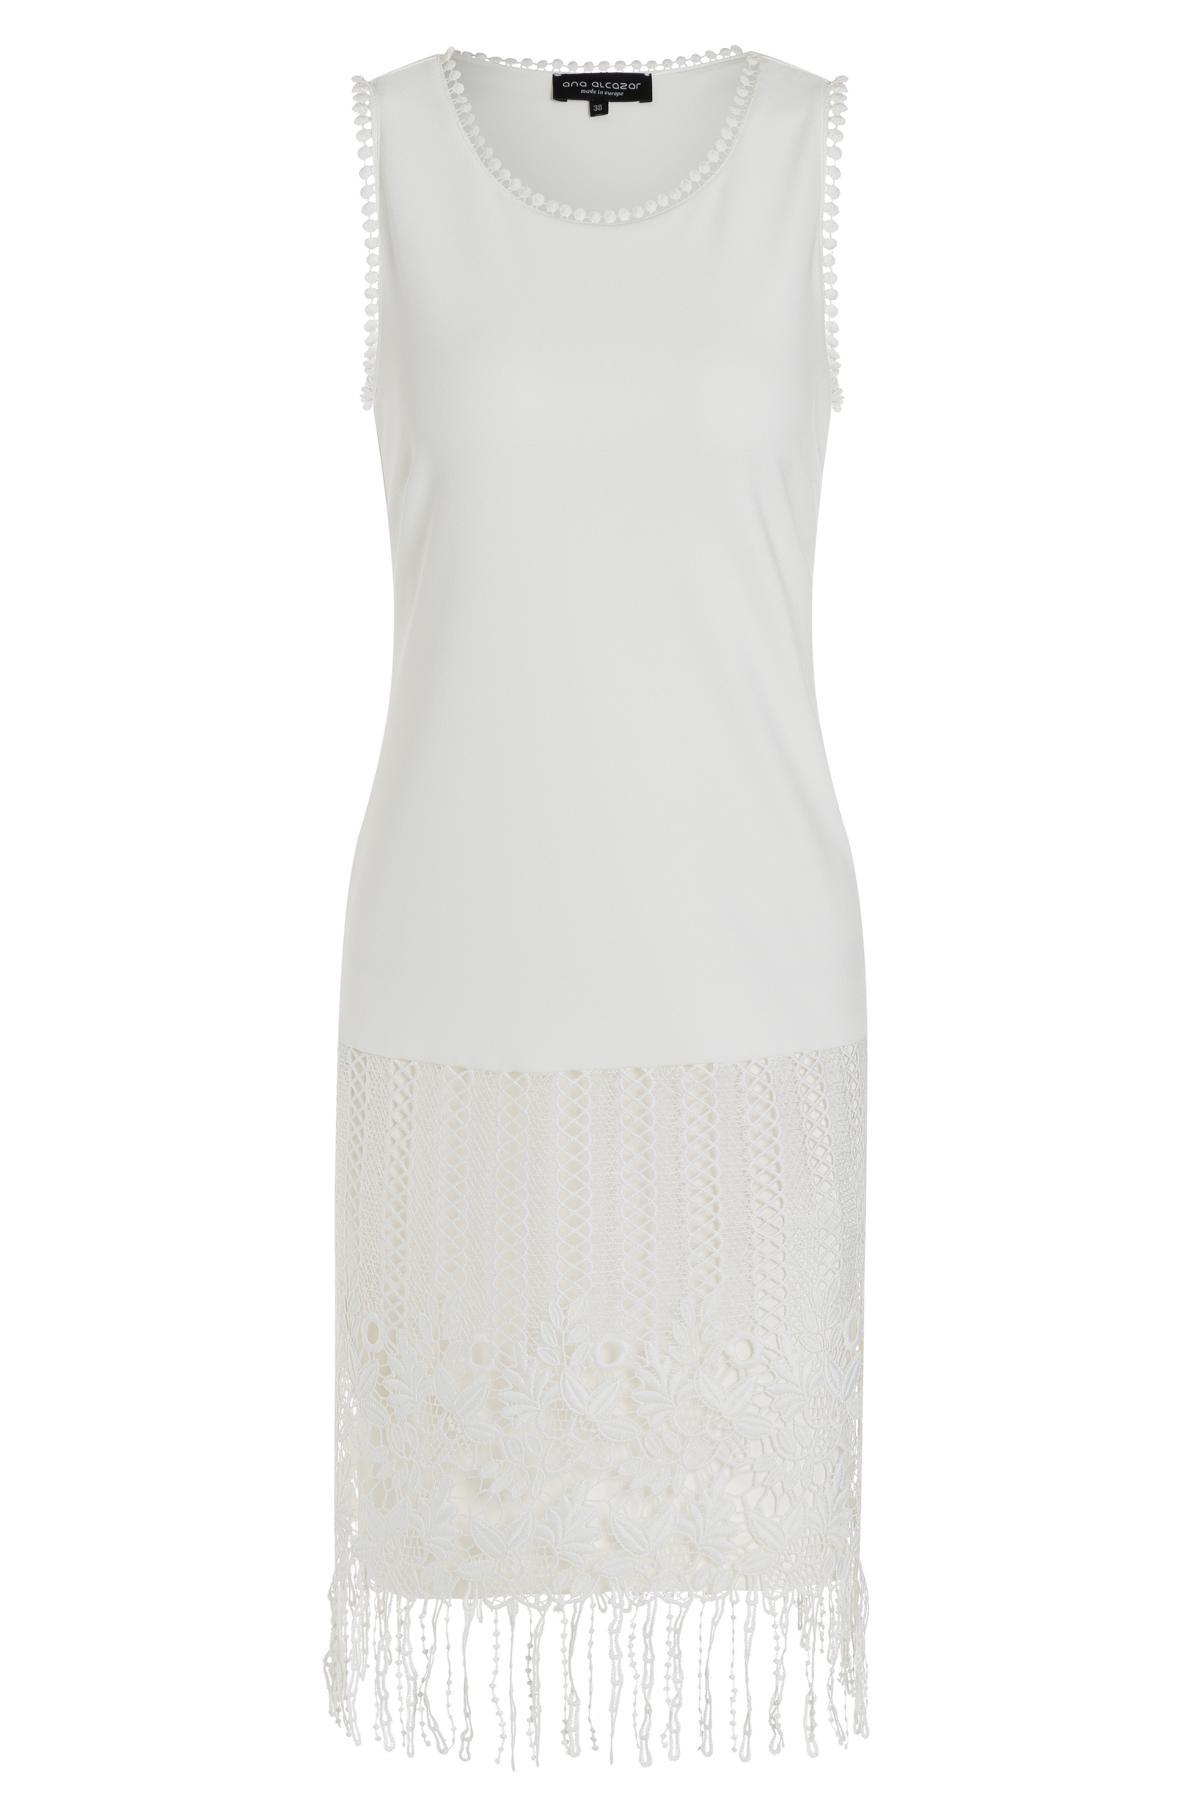 d14c42d9357bd9 Wit Charlston jurk Tadone van kant-mix